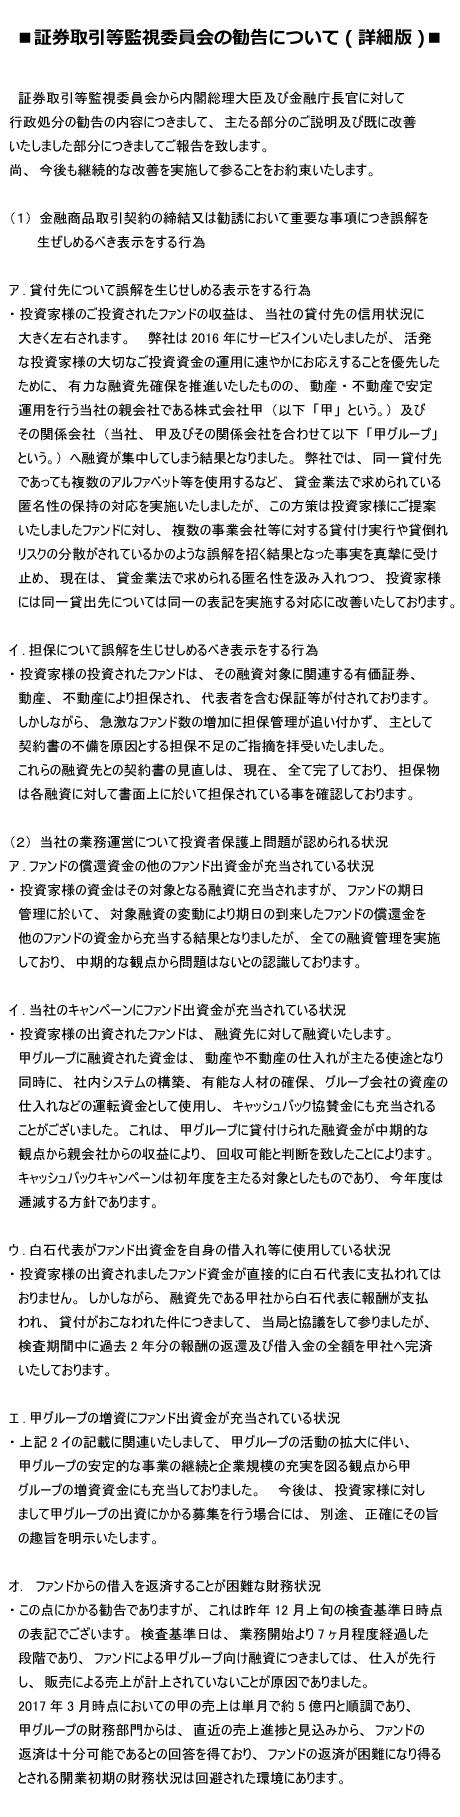 170327_gyouseishobun_shousai1.jpg